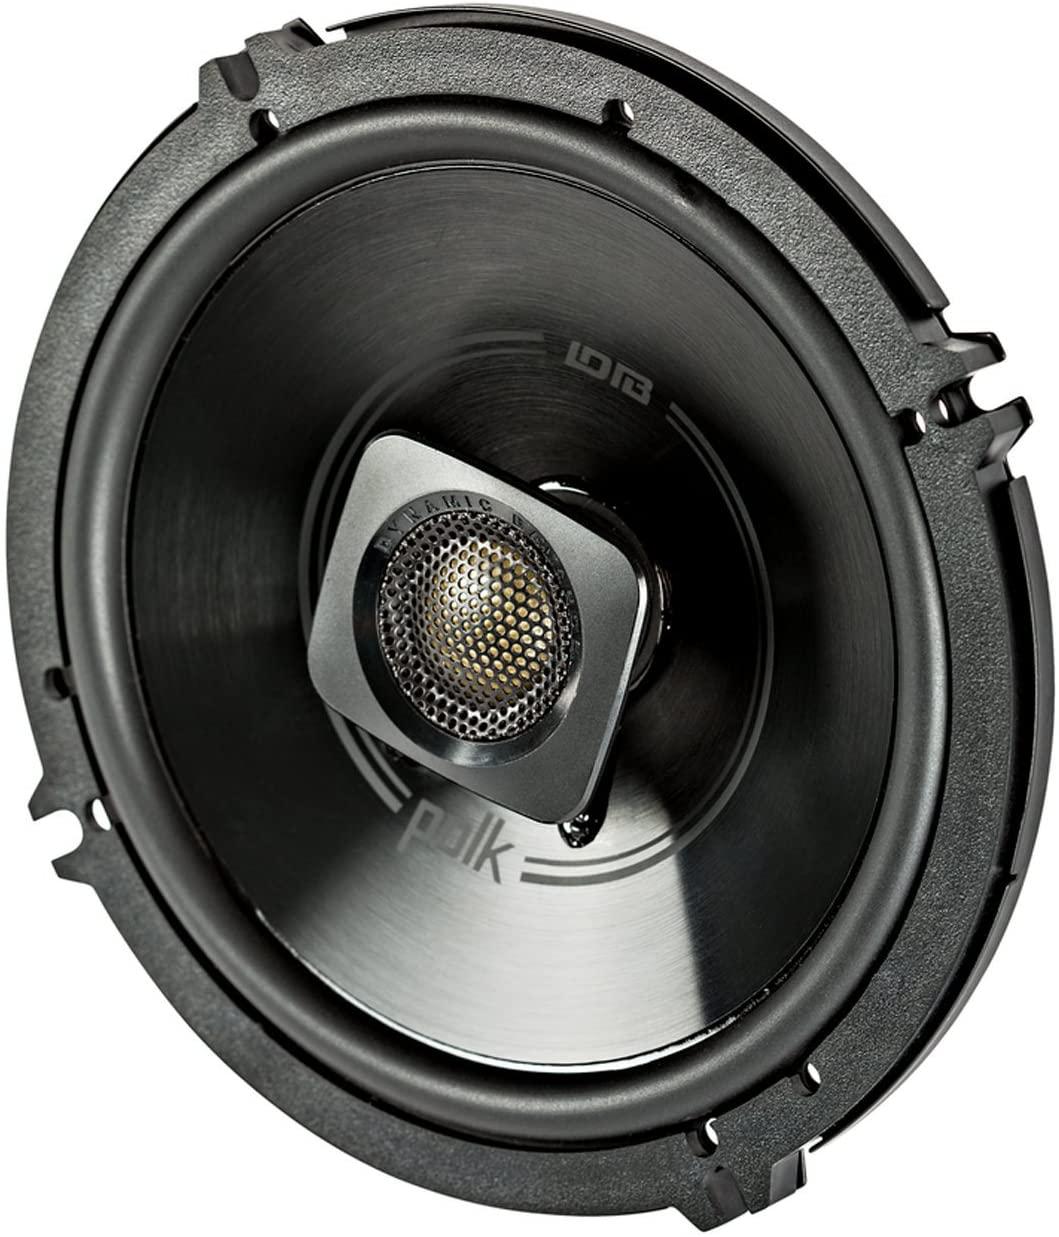 Polk DB652 UltraMarine Dynamic Balance Coaxial Speakers Car Speakers Review